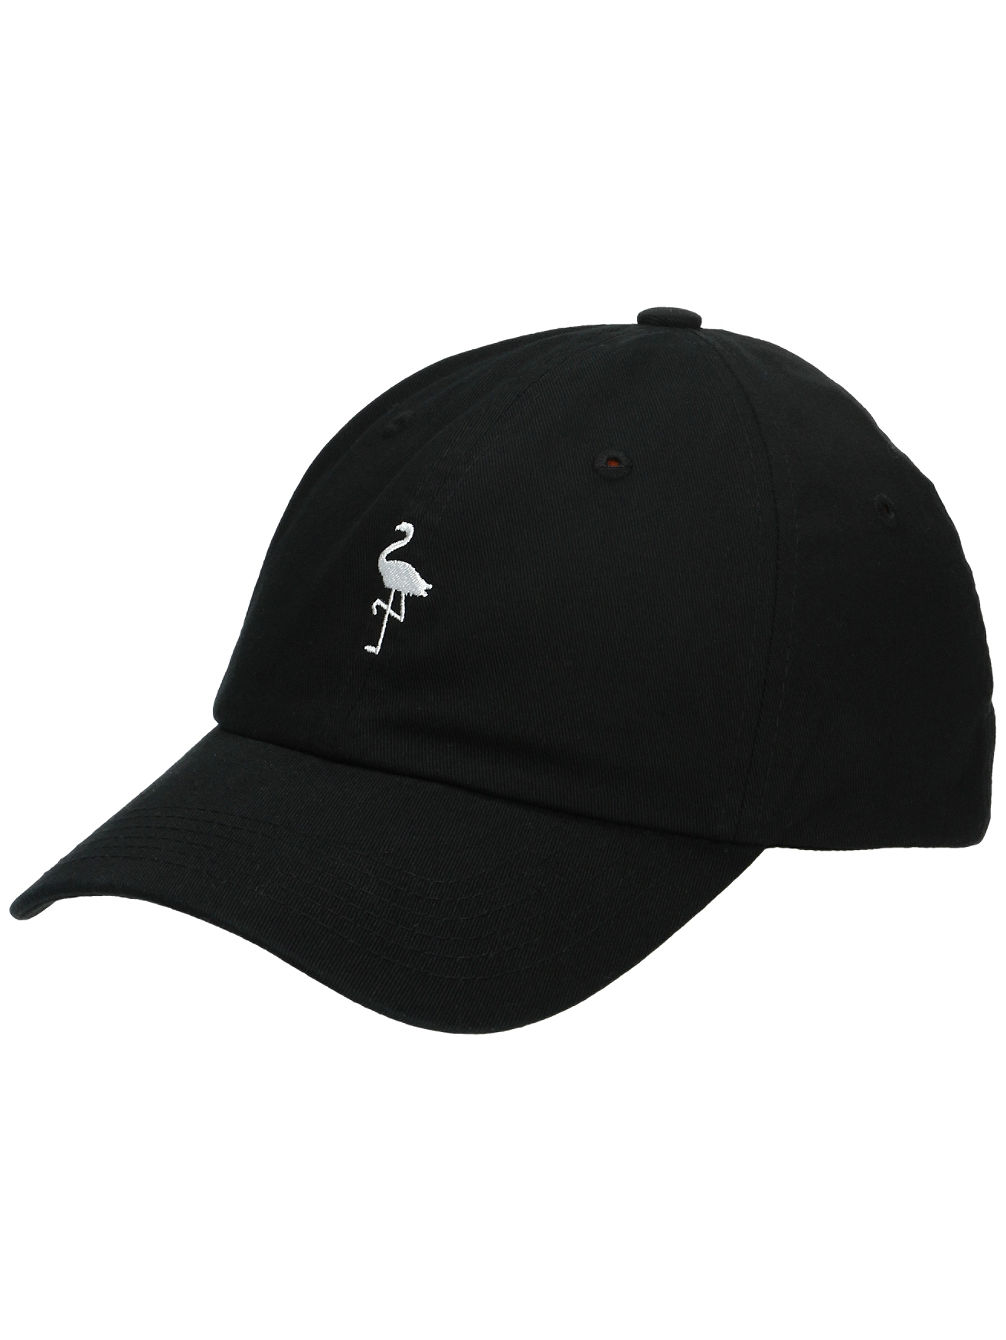 fla-bingo-black-baseball-cap